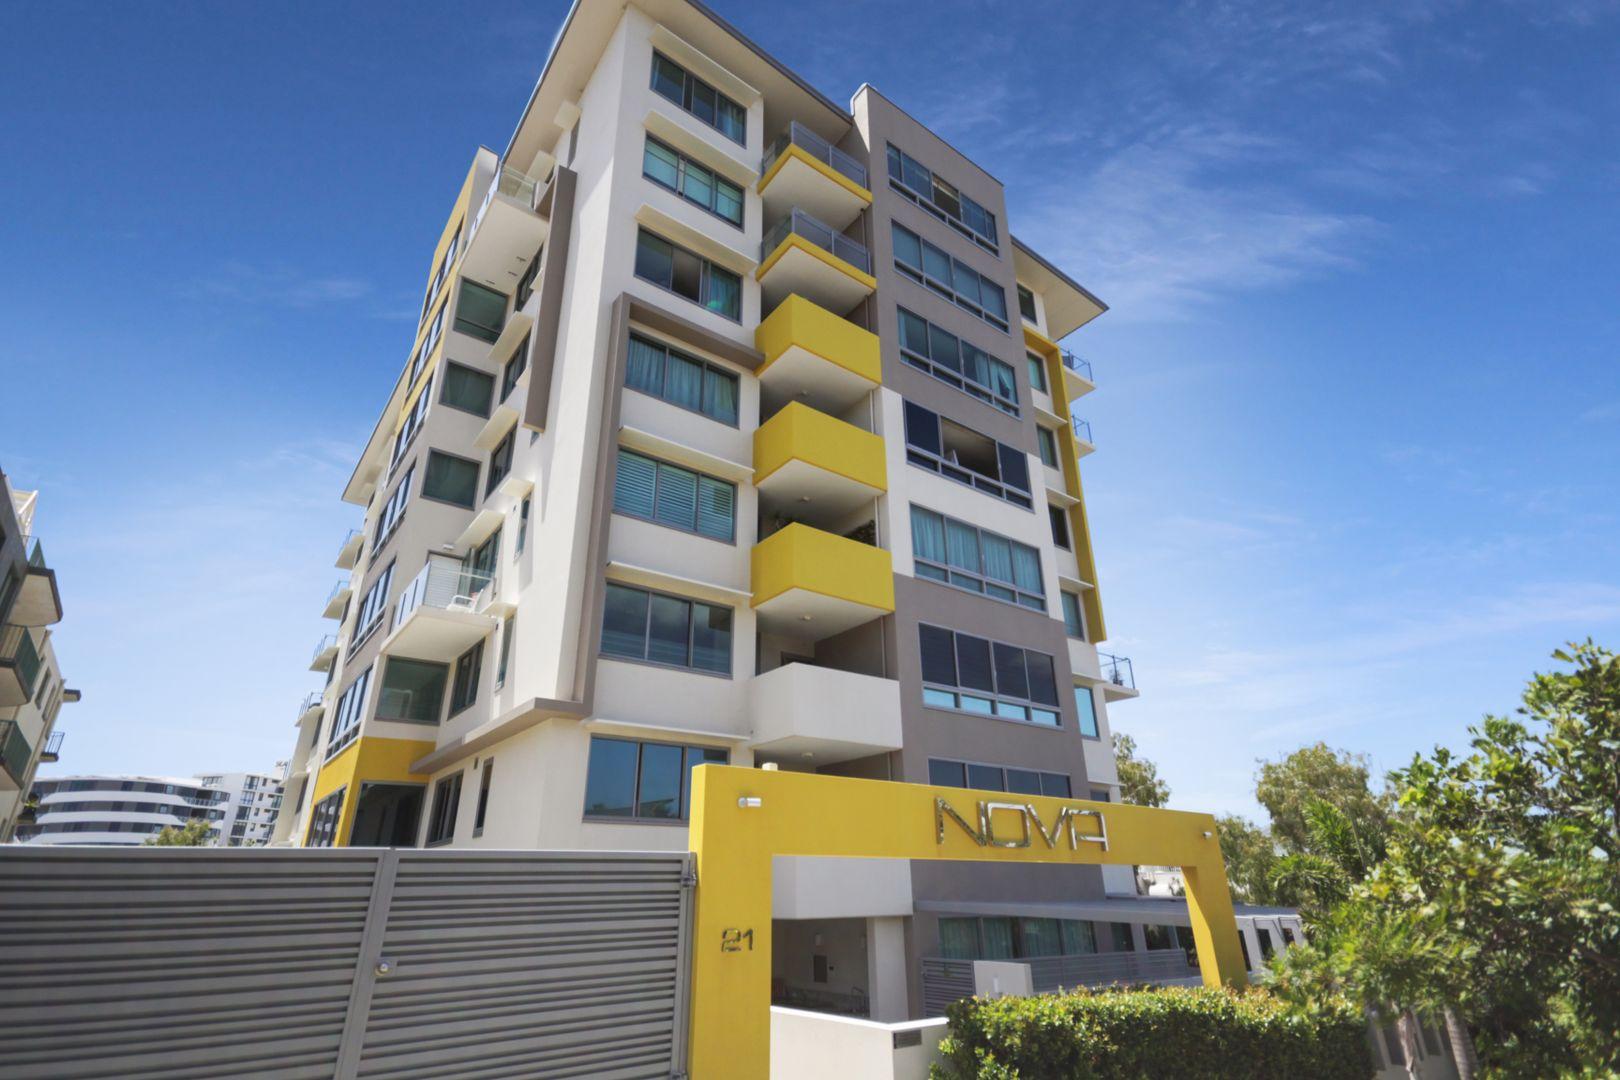 606/21 Douglas Street, Mooloolaba QLD 4557, Image 0